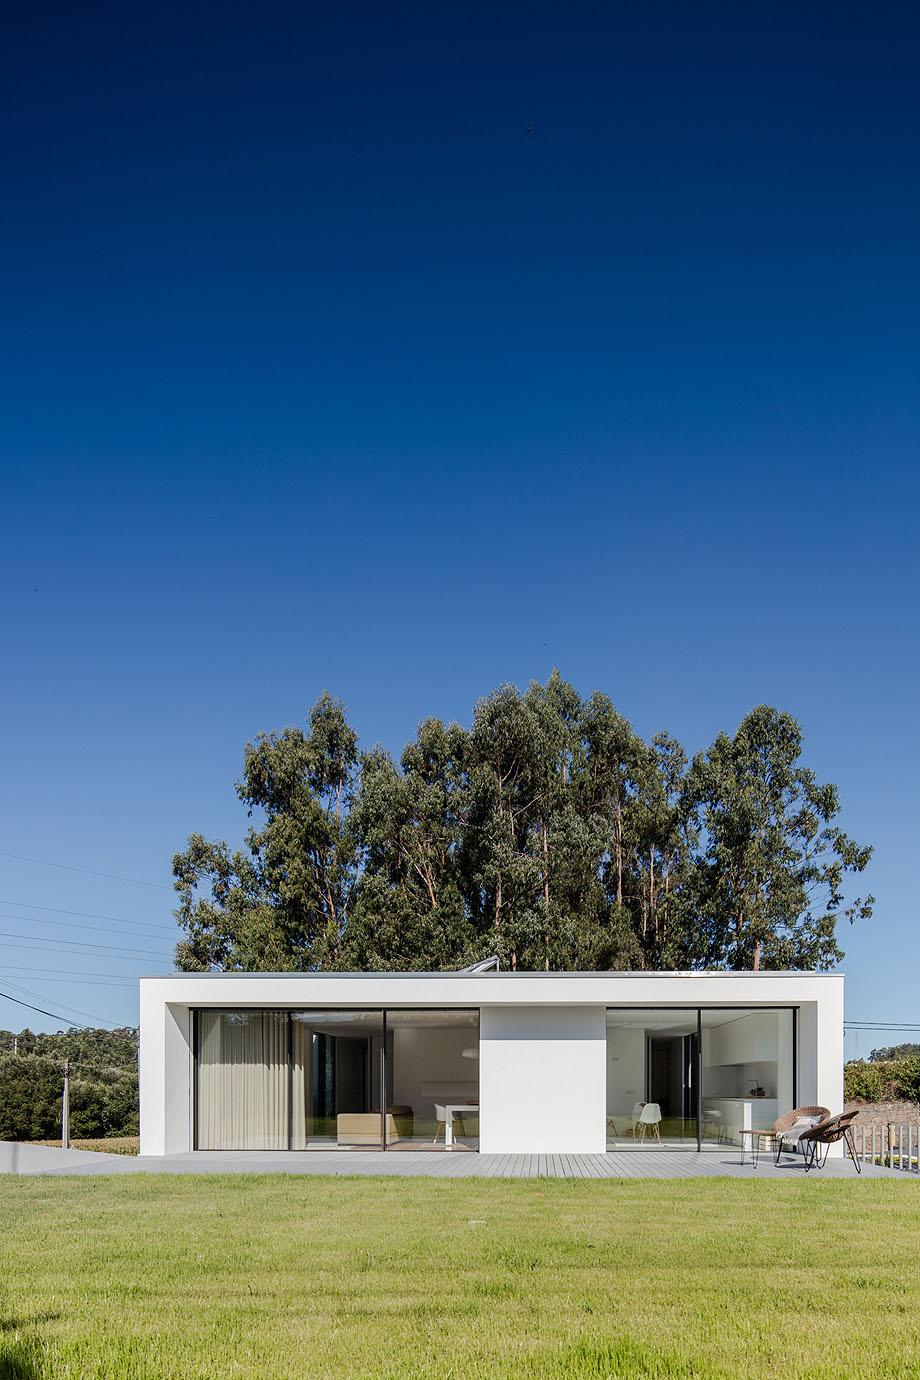 Casa Touguinha - Raulino Arquitecto (13)